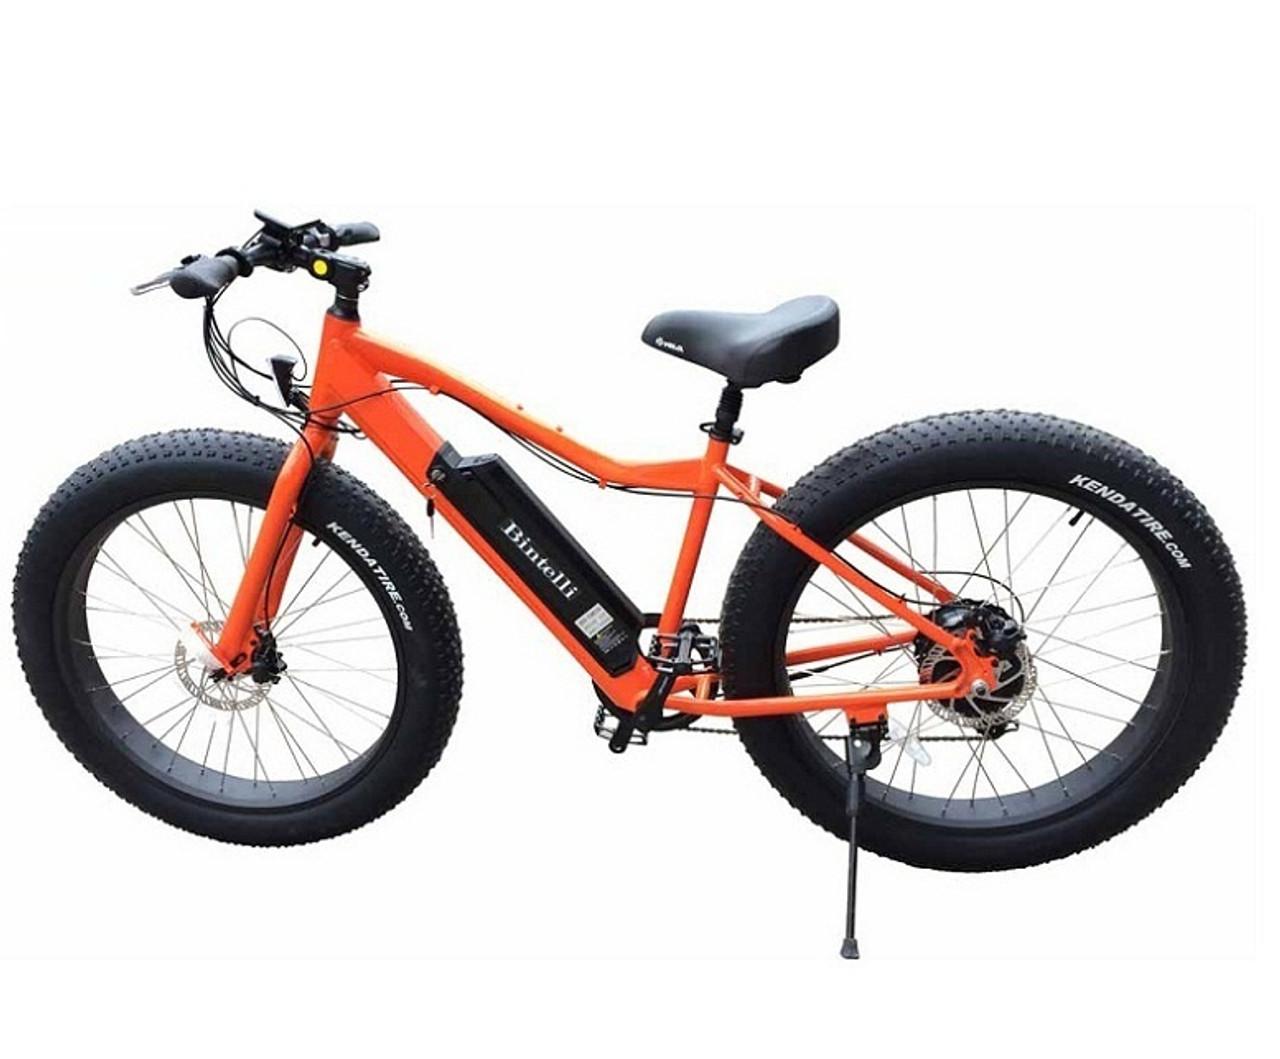 Bintelli M1 Electric Bicycle, 48V 750w, Rear-Mounted Brushless Hub